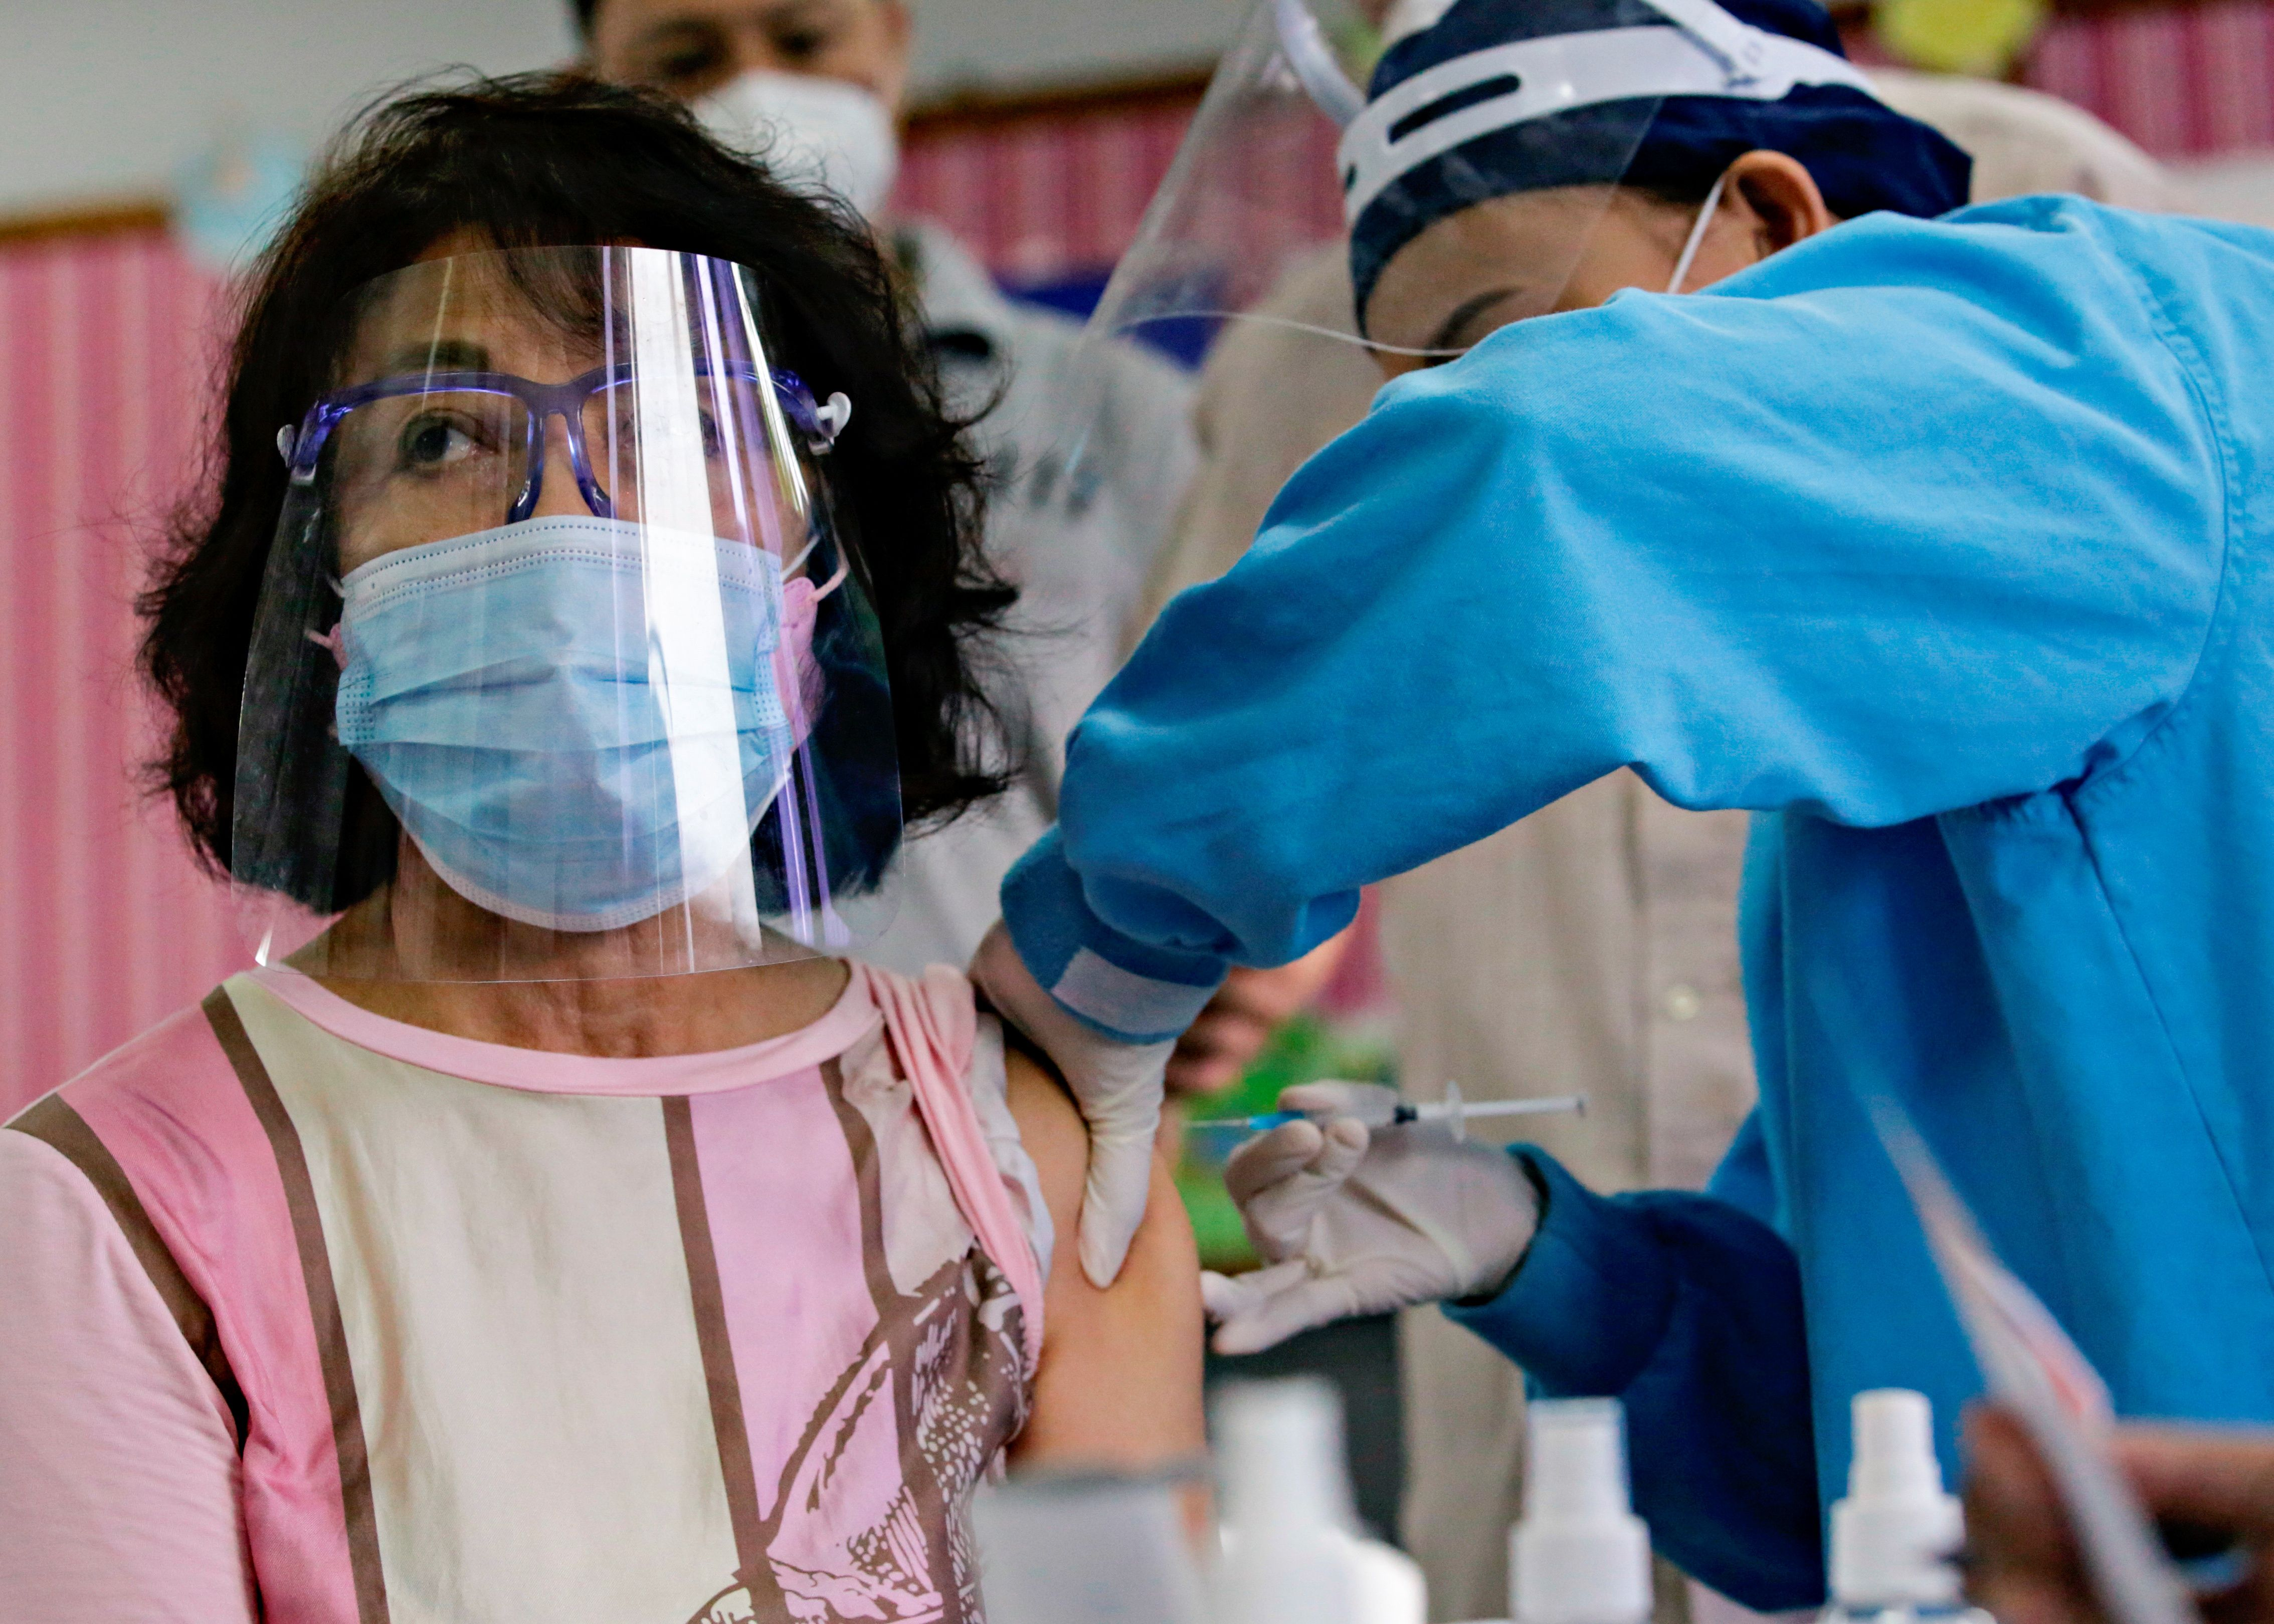 Una mujer recibe la vacuna SinoVac en Yakarta, Indonesia - REUTERS/Ajeng Dinar Ulfiana  REUTERS/Ajeng Dinar Ulfiana